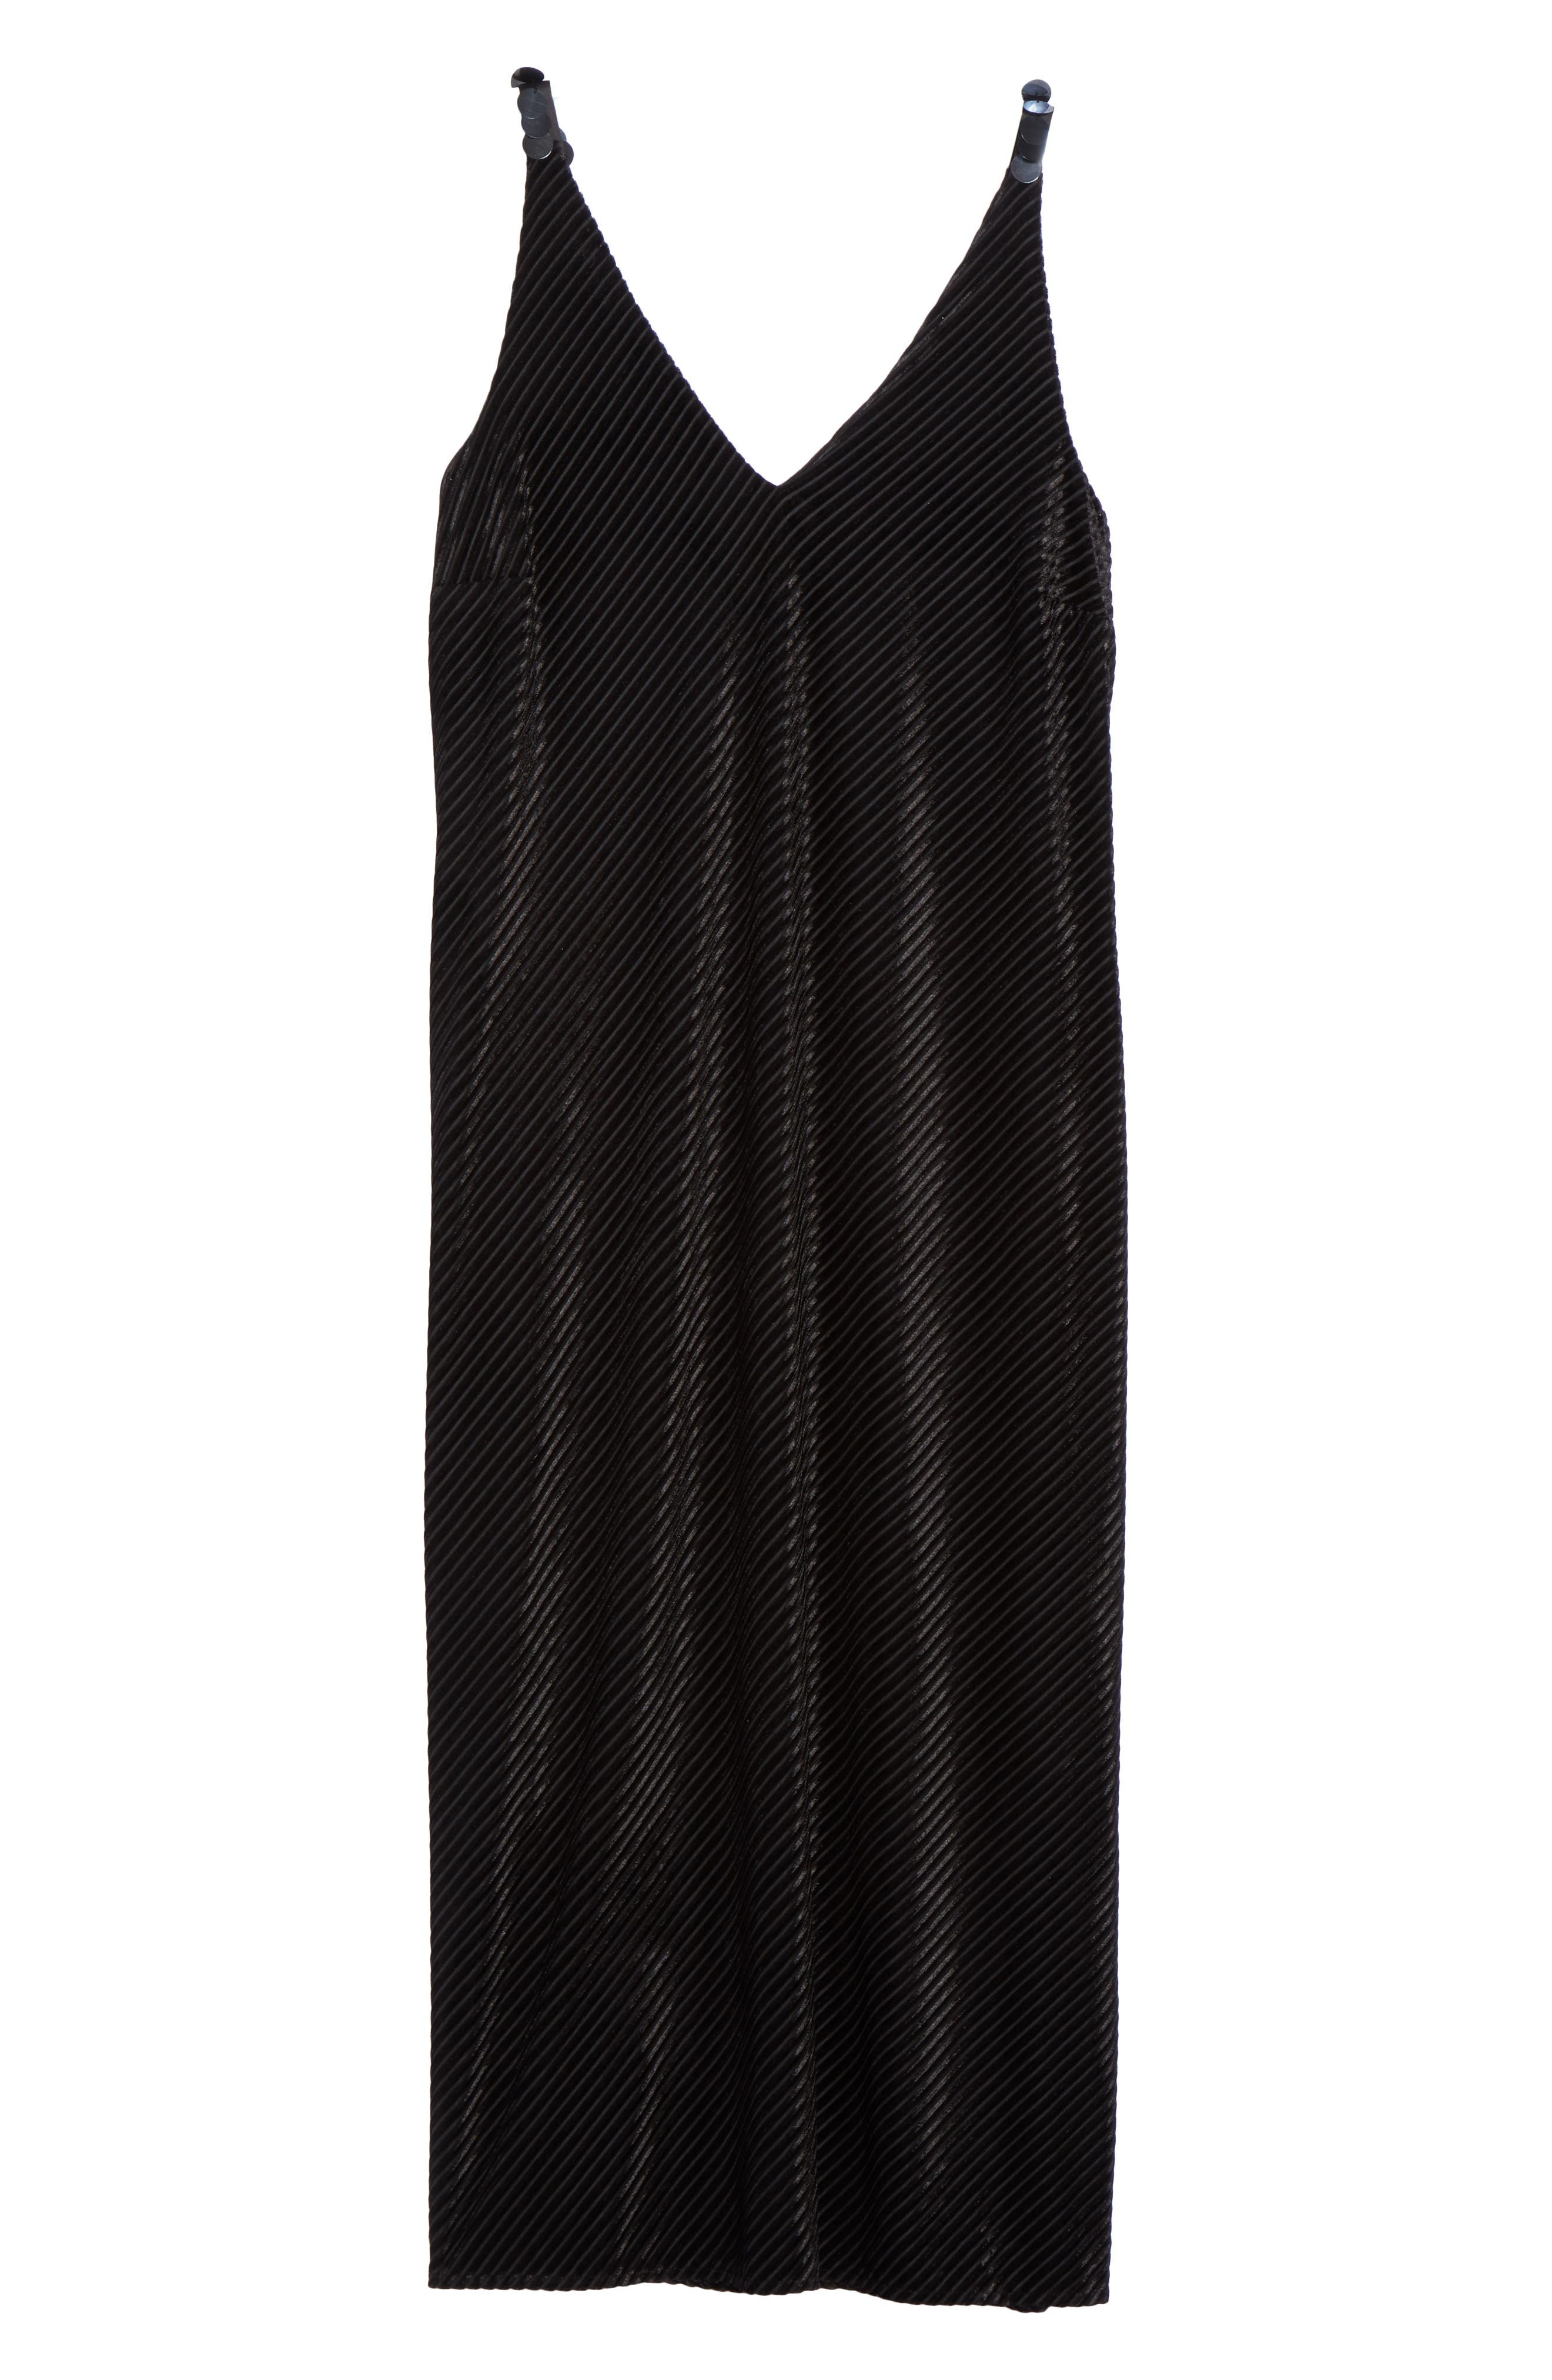 NIC+ ZOE Stunning Midi Slipdress,                             Alternate thumbnail 6, color,                             Black Onyx